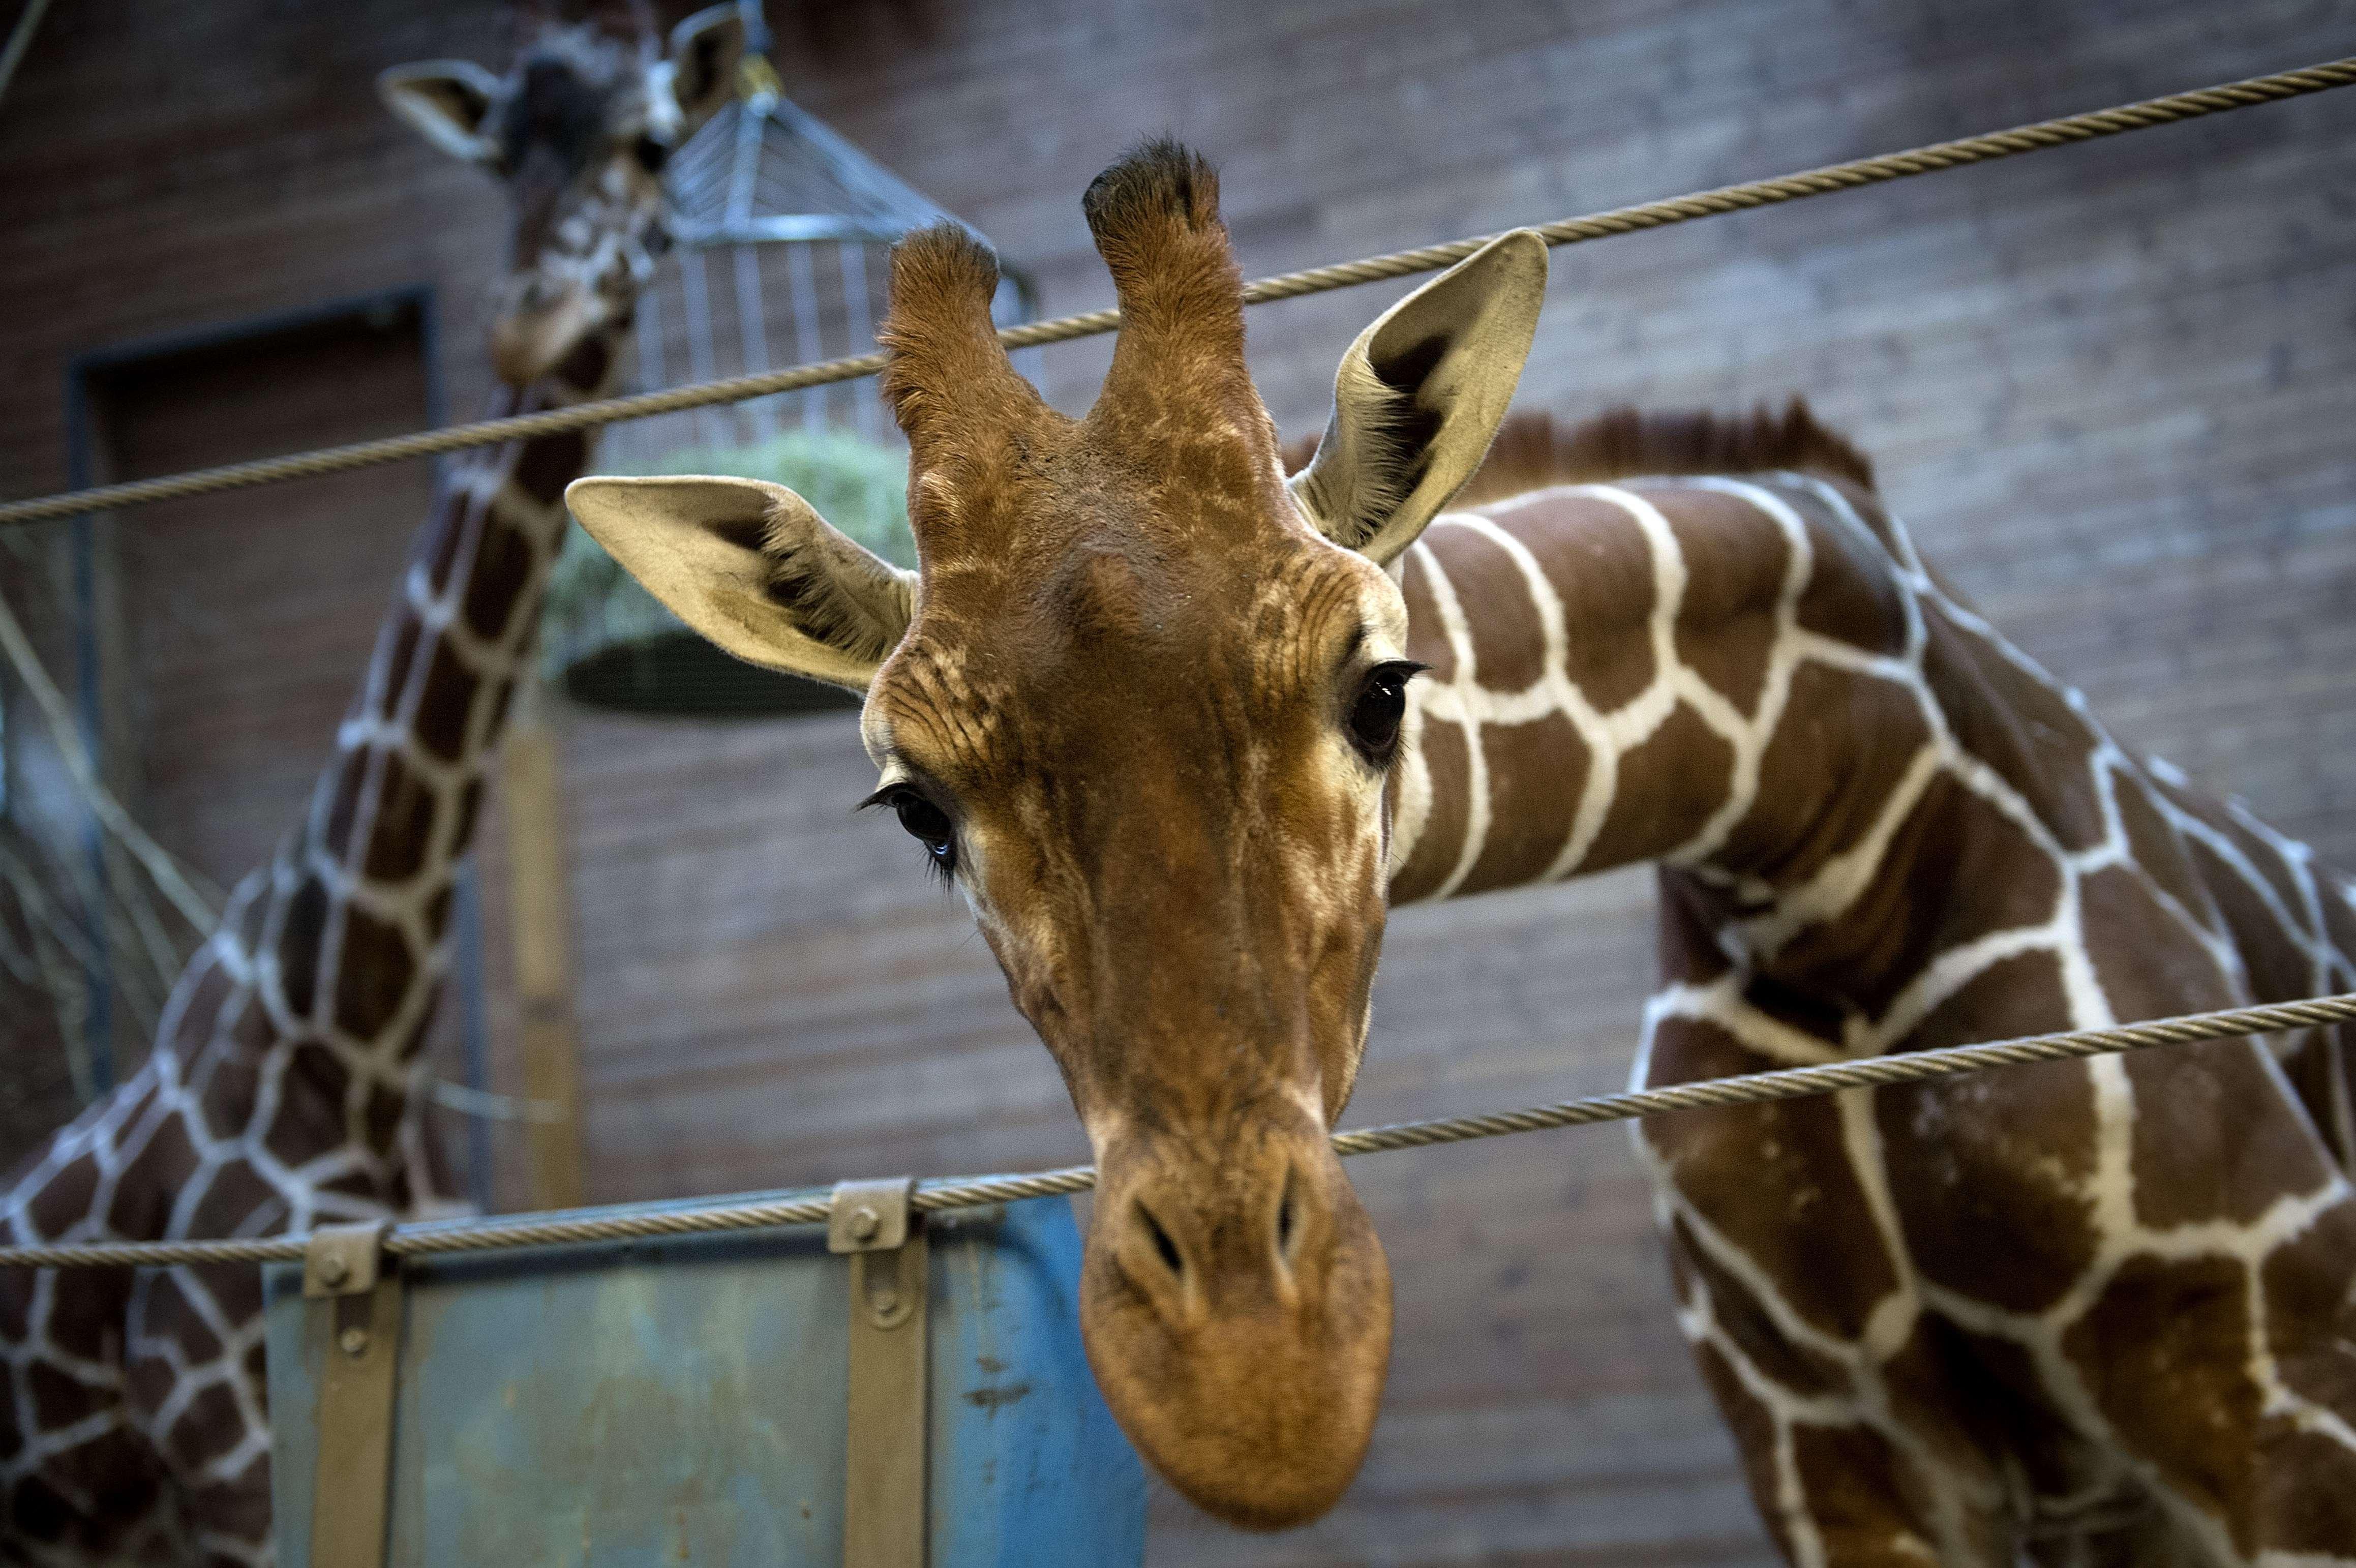 Marius the giraffe at Copenhagen zoo, on Feb. 7, 2014.